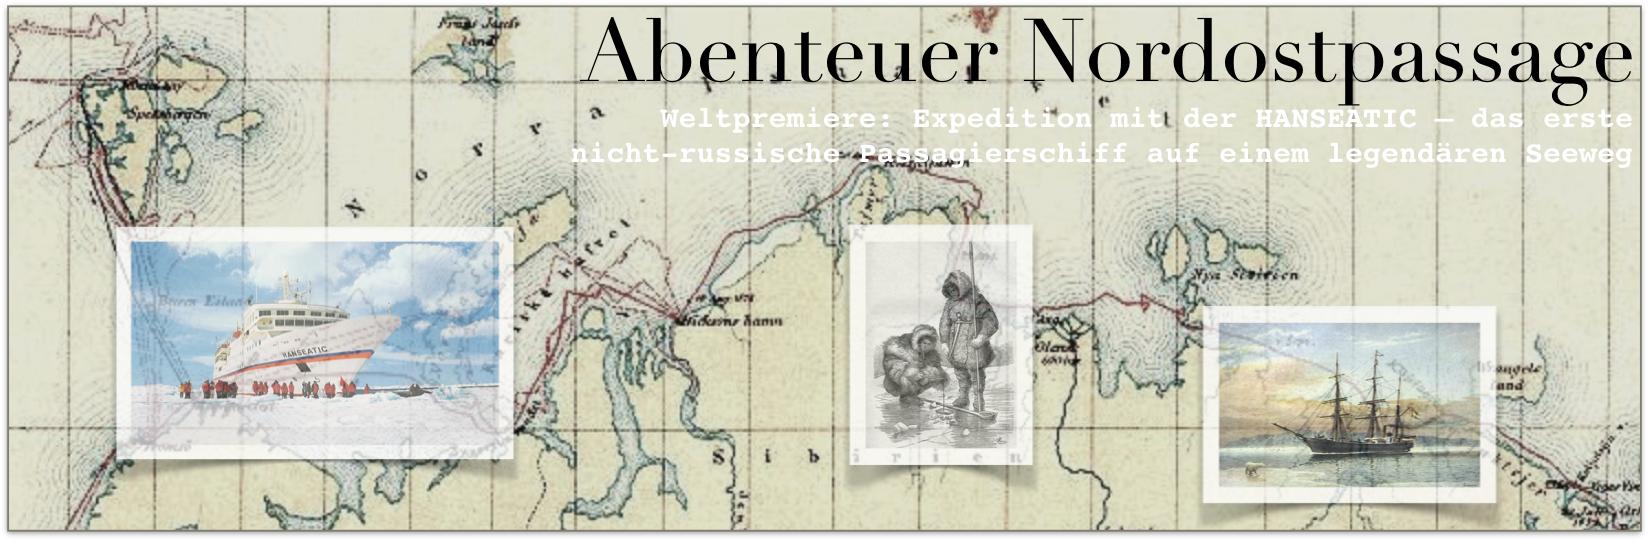 Abenteuer Nordostpassage Grafik neu